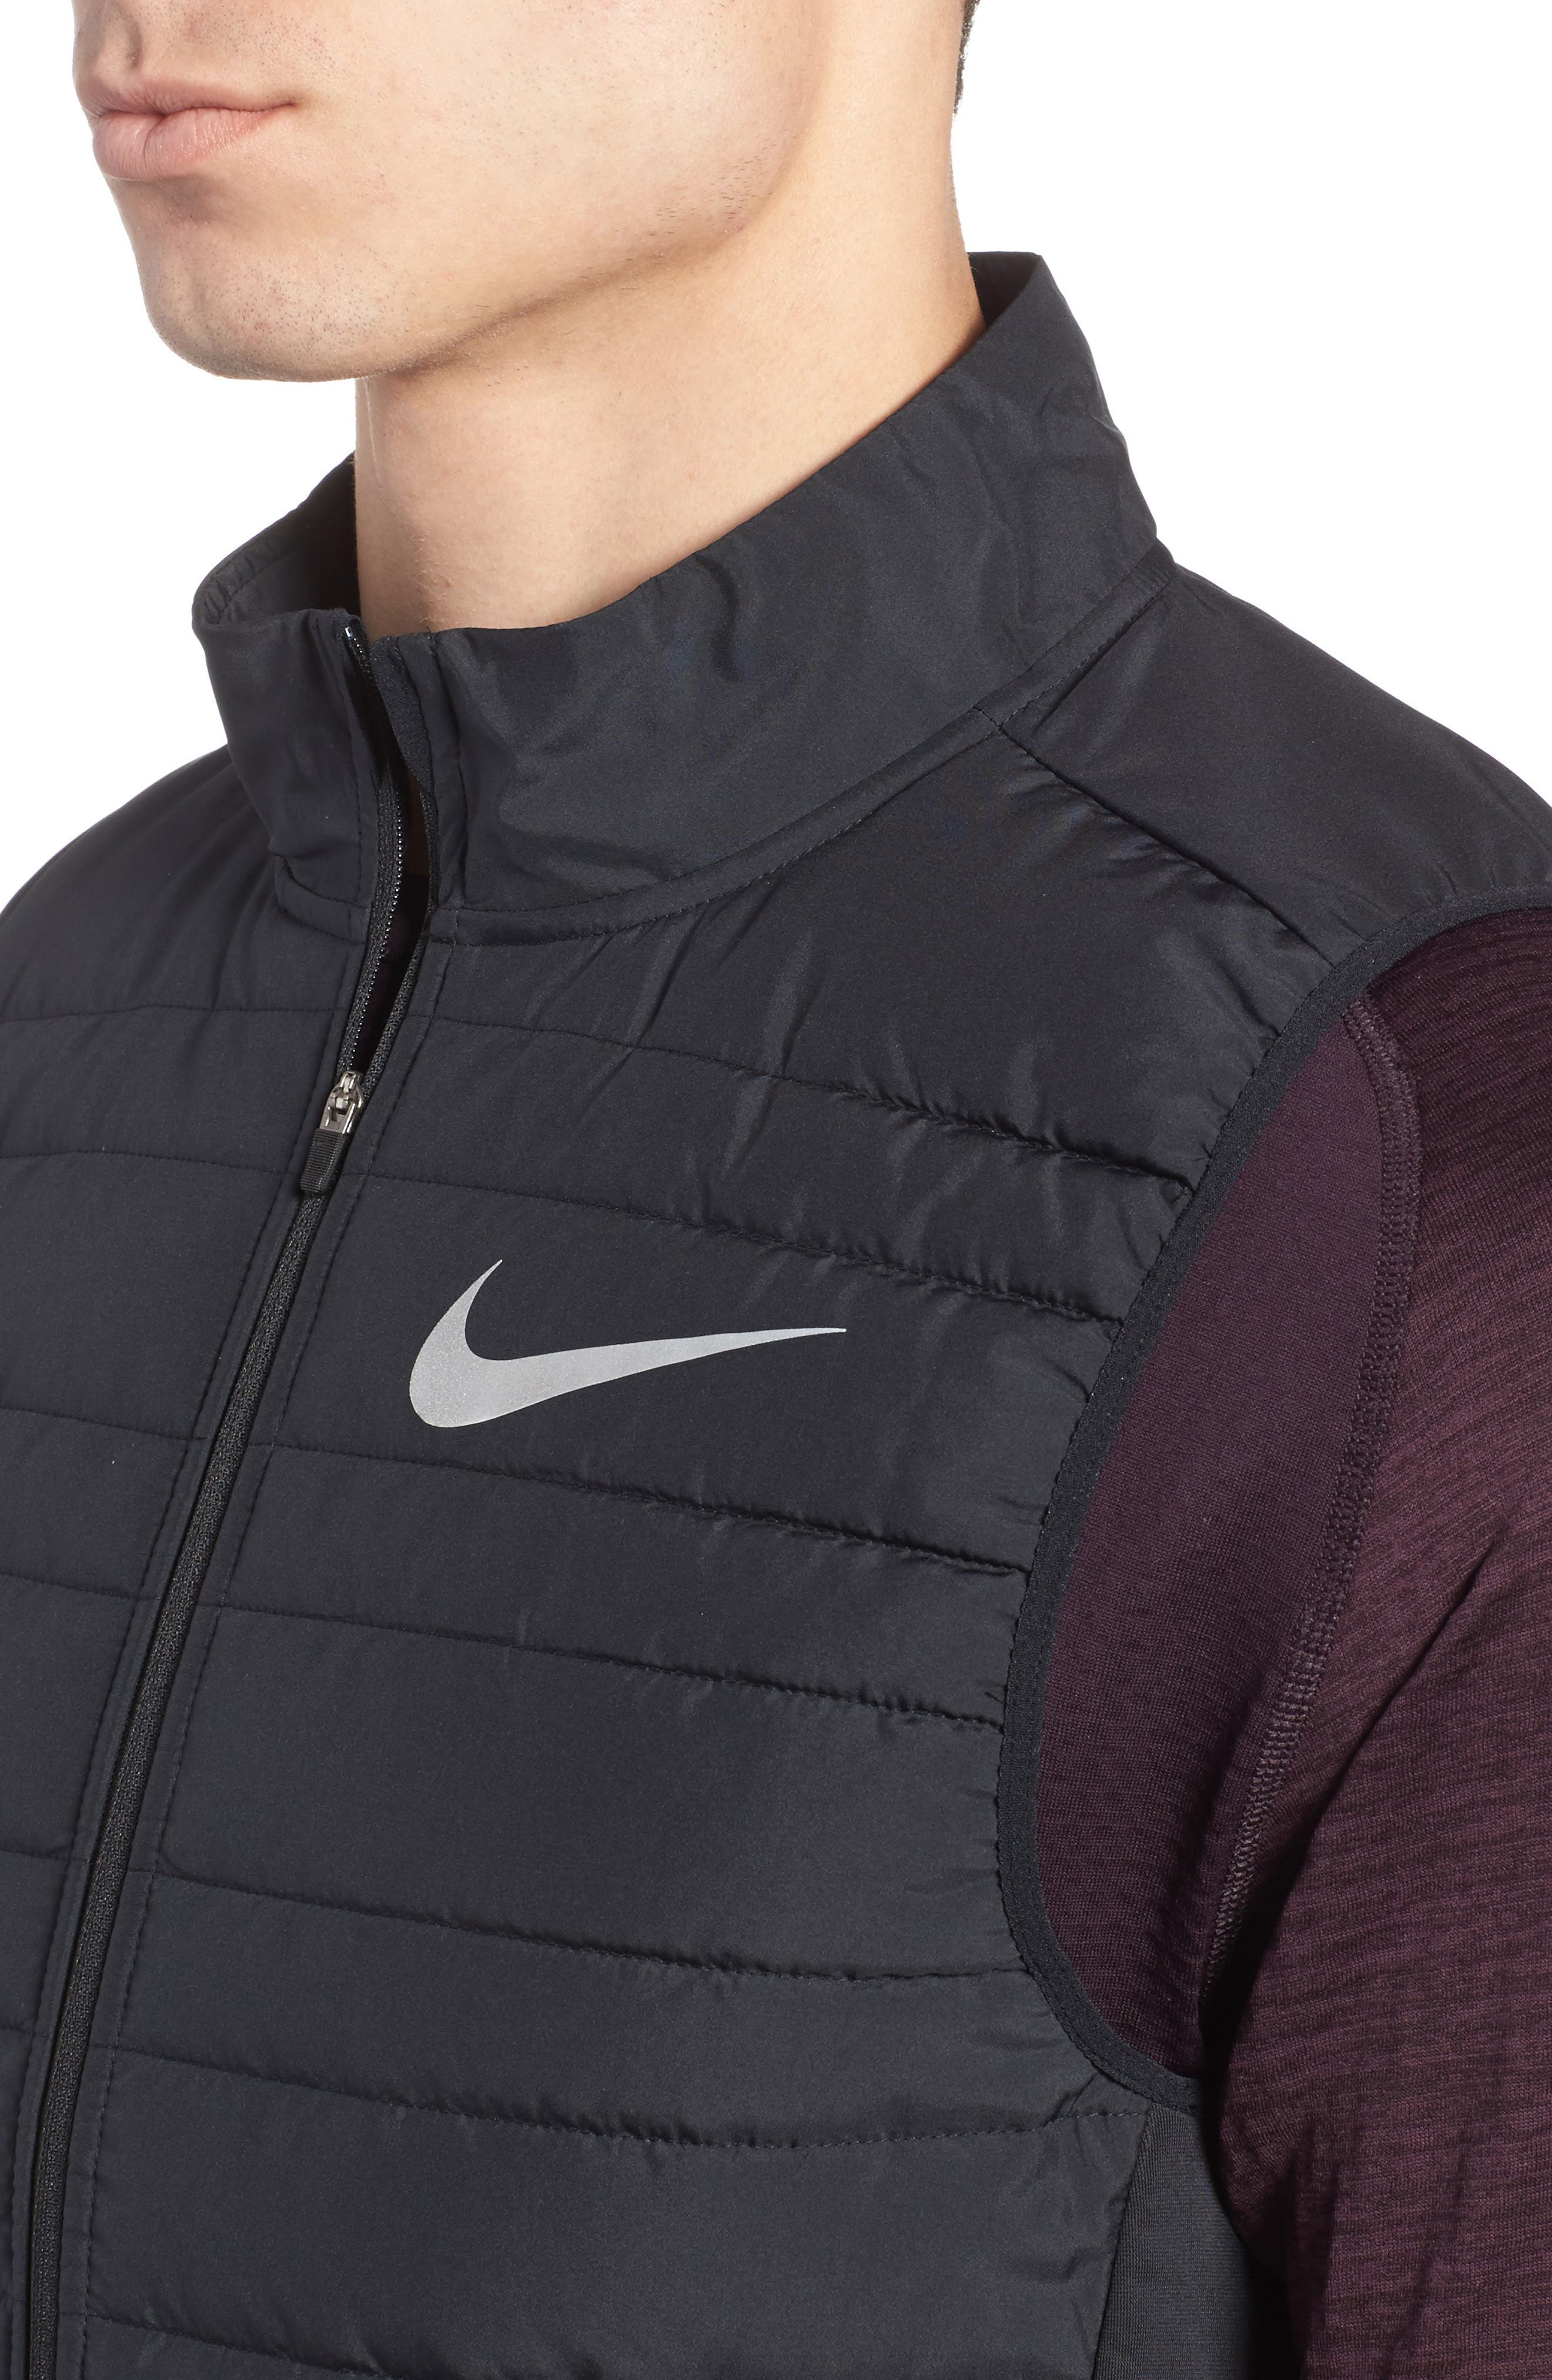 Essential Running Vest,                             Alternate thumbnail 4, color,                             010